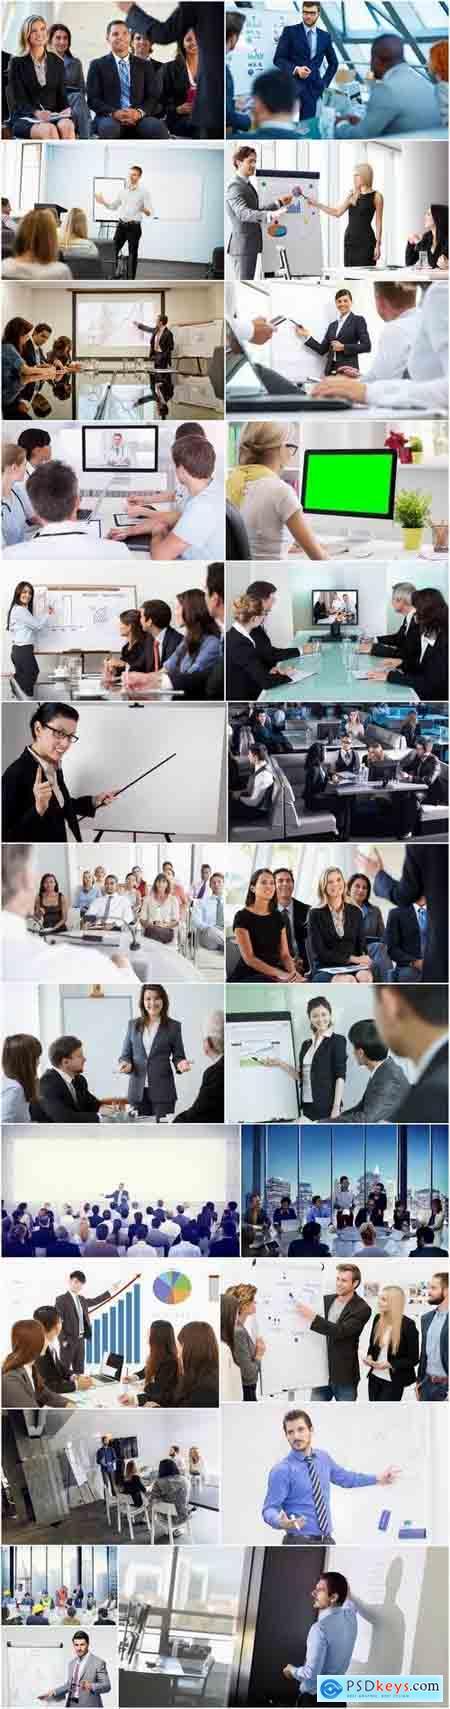 Business presentation businessman business woman 25 HQ Jpeg